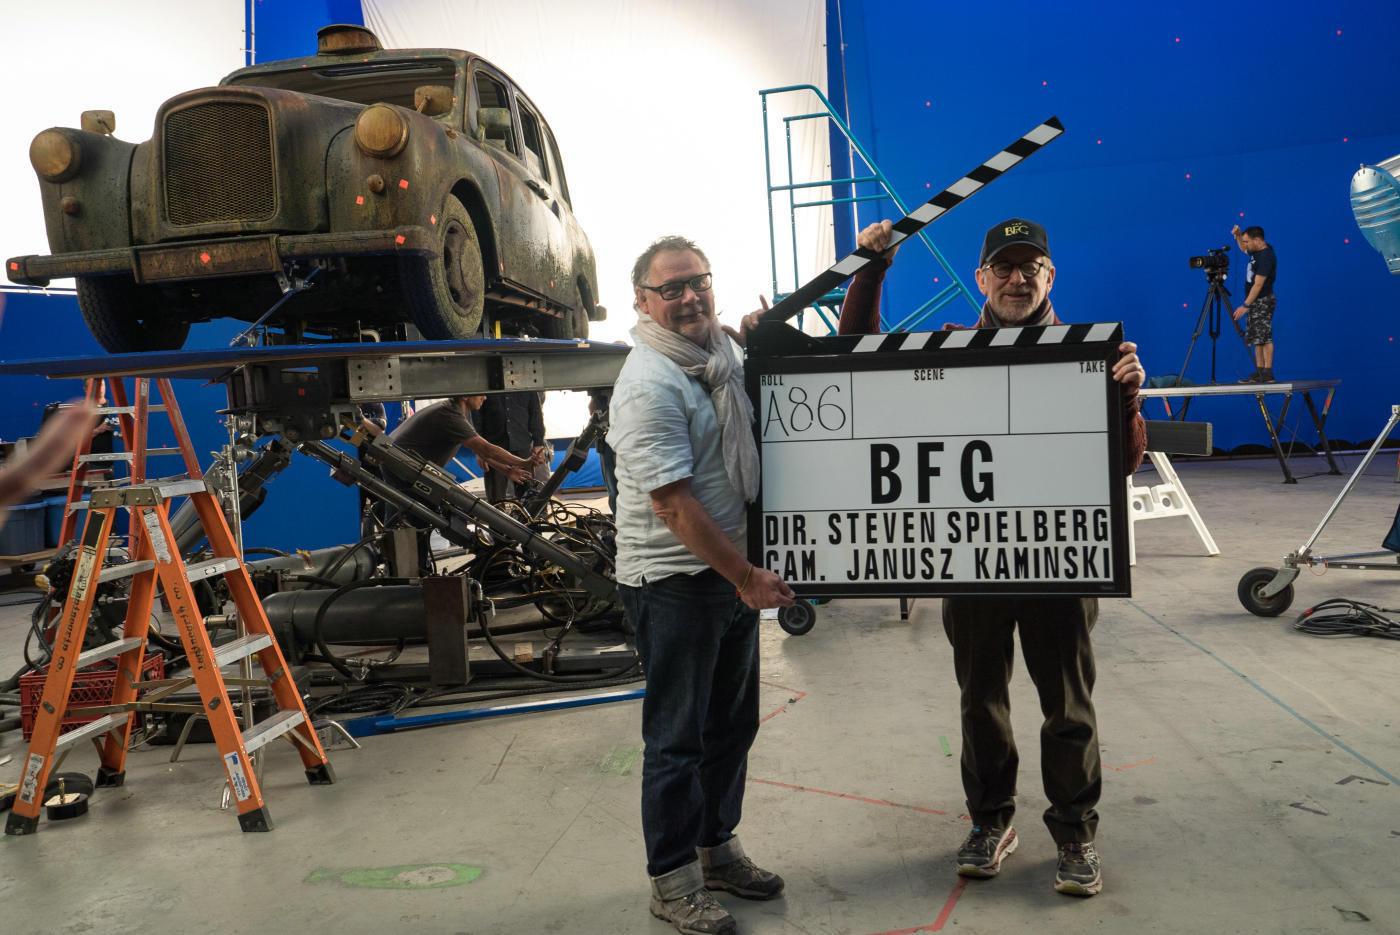 On Set of The BFG Behind the Scenes